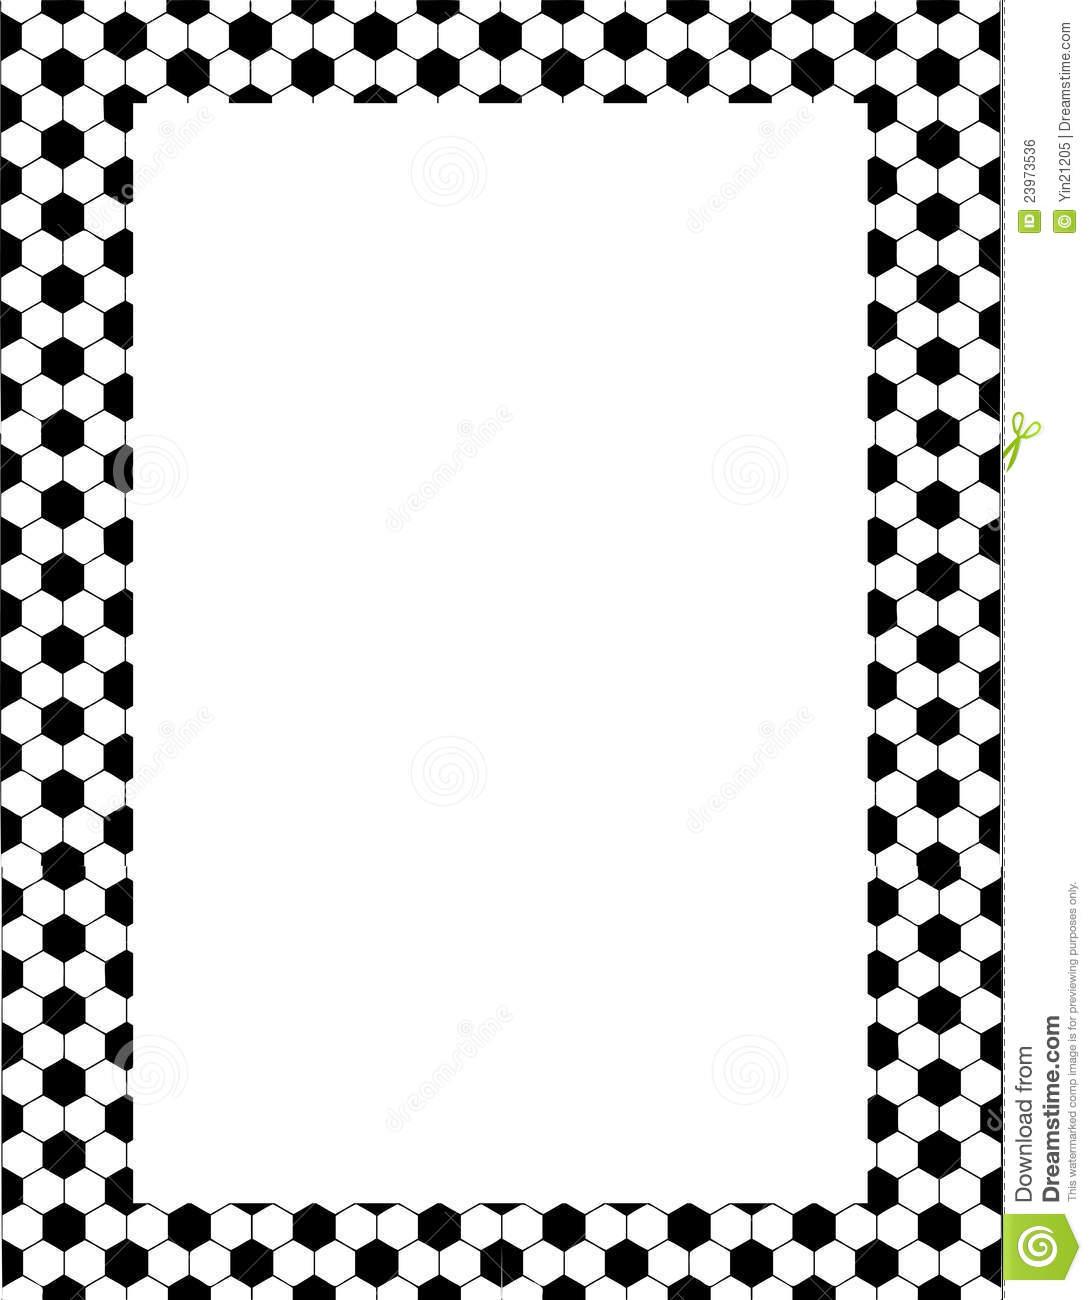 1092x1300 Football Borders Clipart